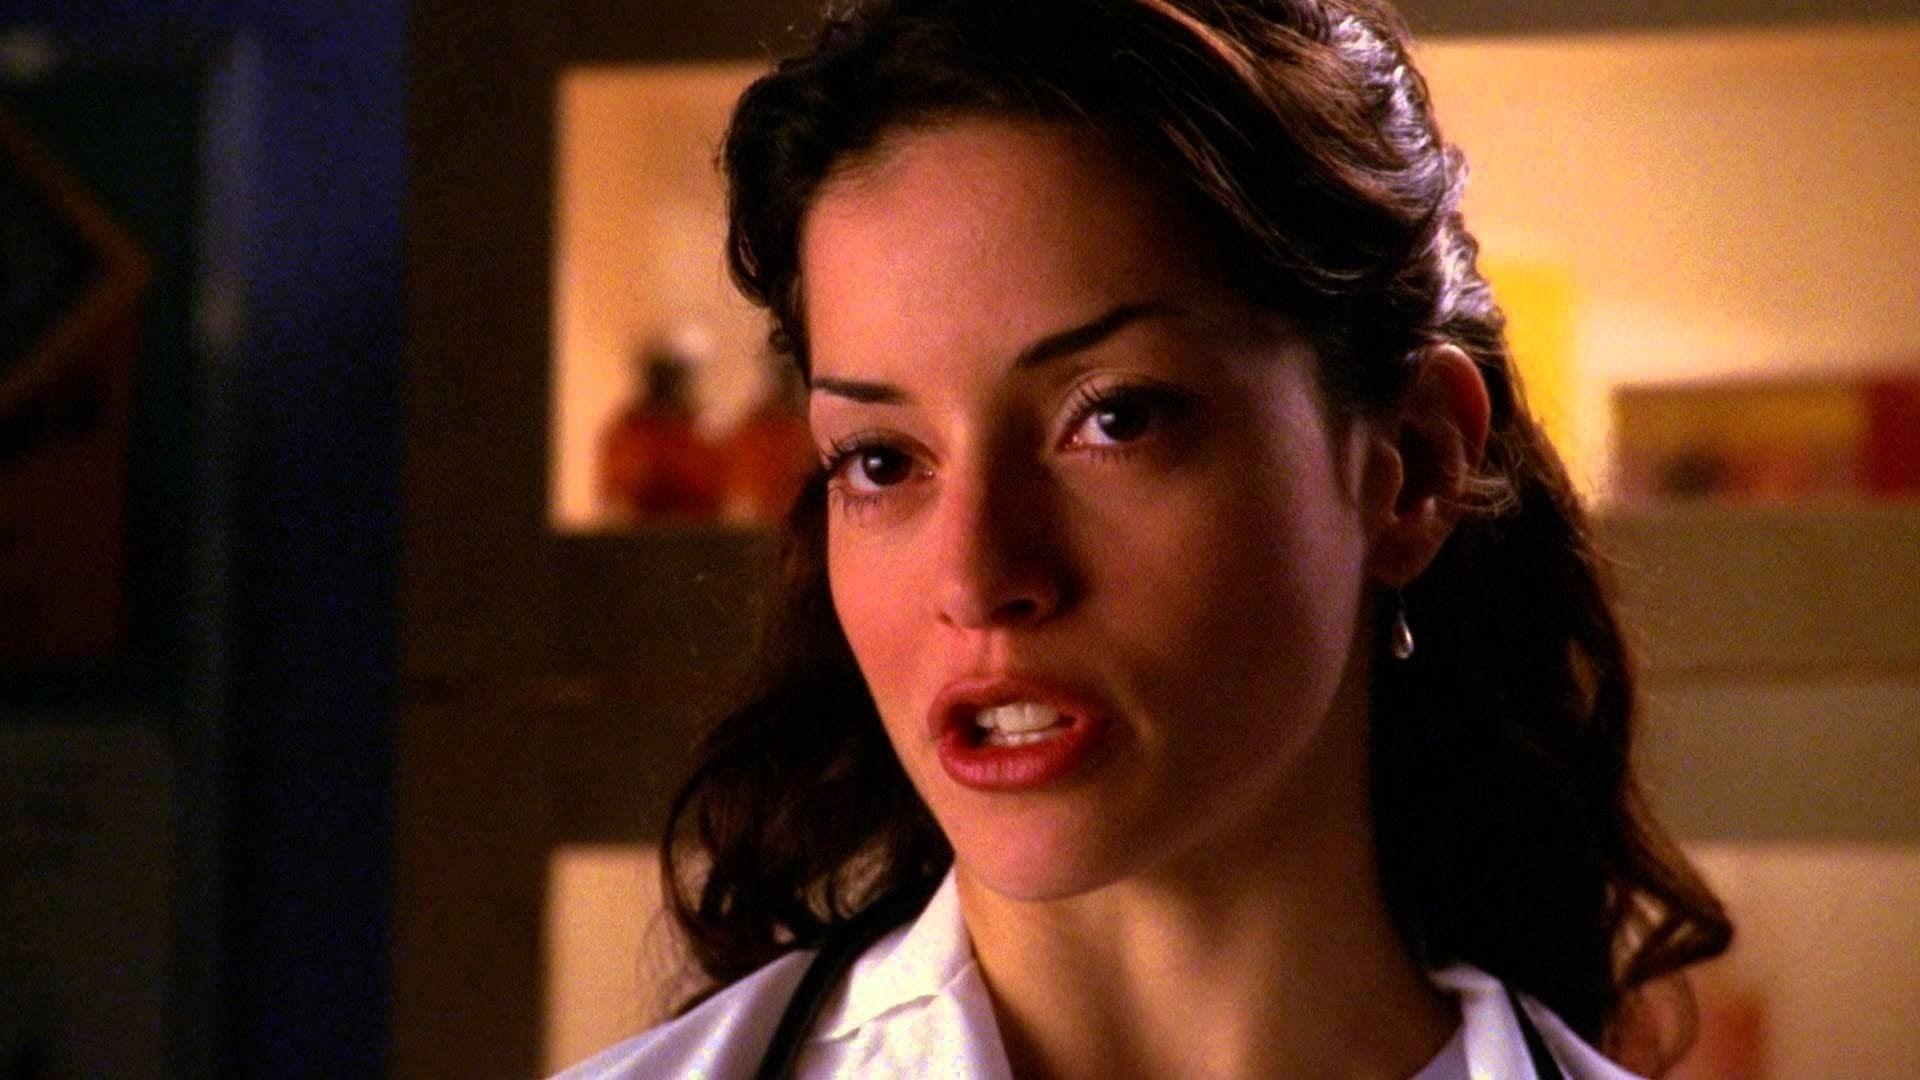 Ver Smallville: Temporada 1, Capitulo 1 Online Gratis ... Joe Freeman